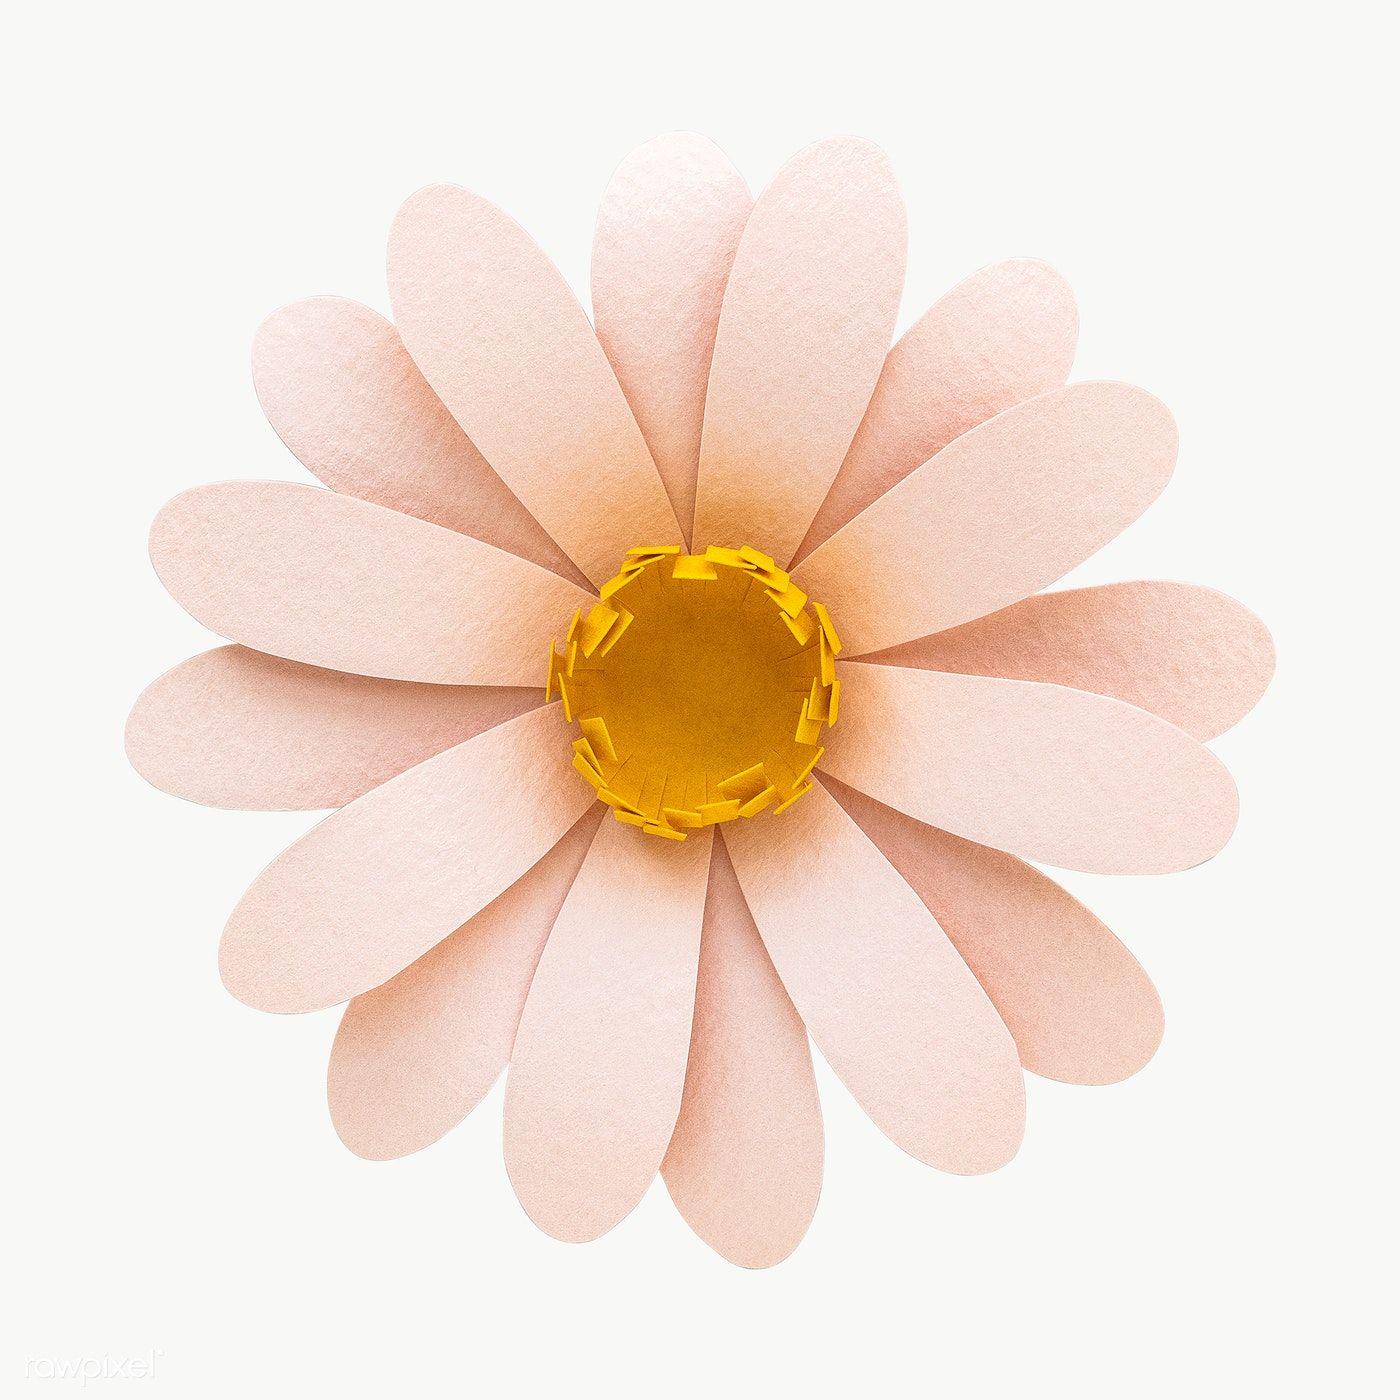 Gerbera Daisy Paper Craft Transparent Png Premium Image By Rawpixel Com Nam Gerbera Daisy Flower Frame White Anemone Flower